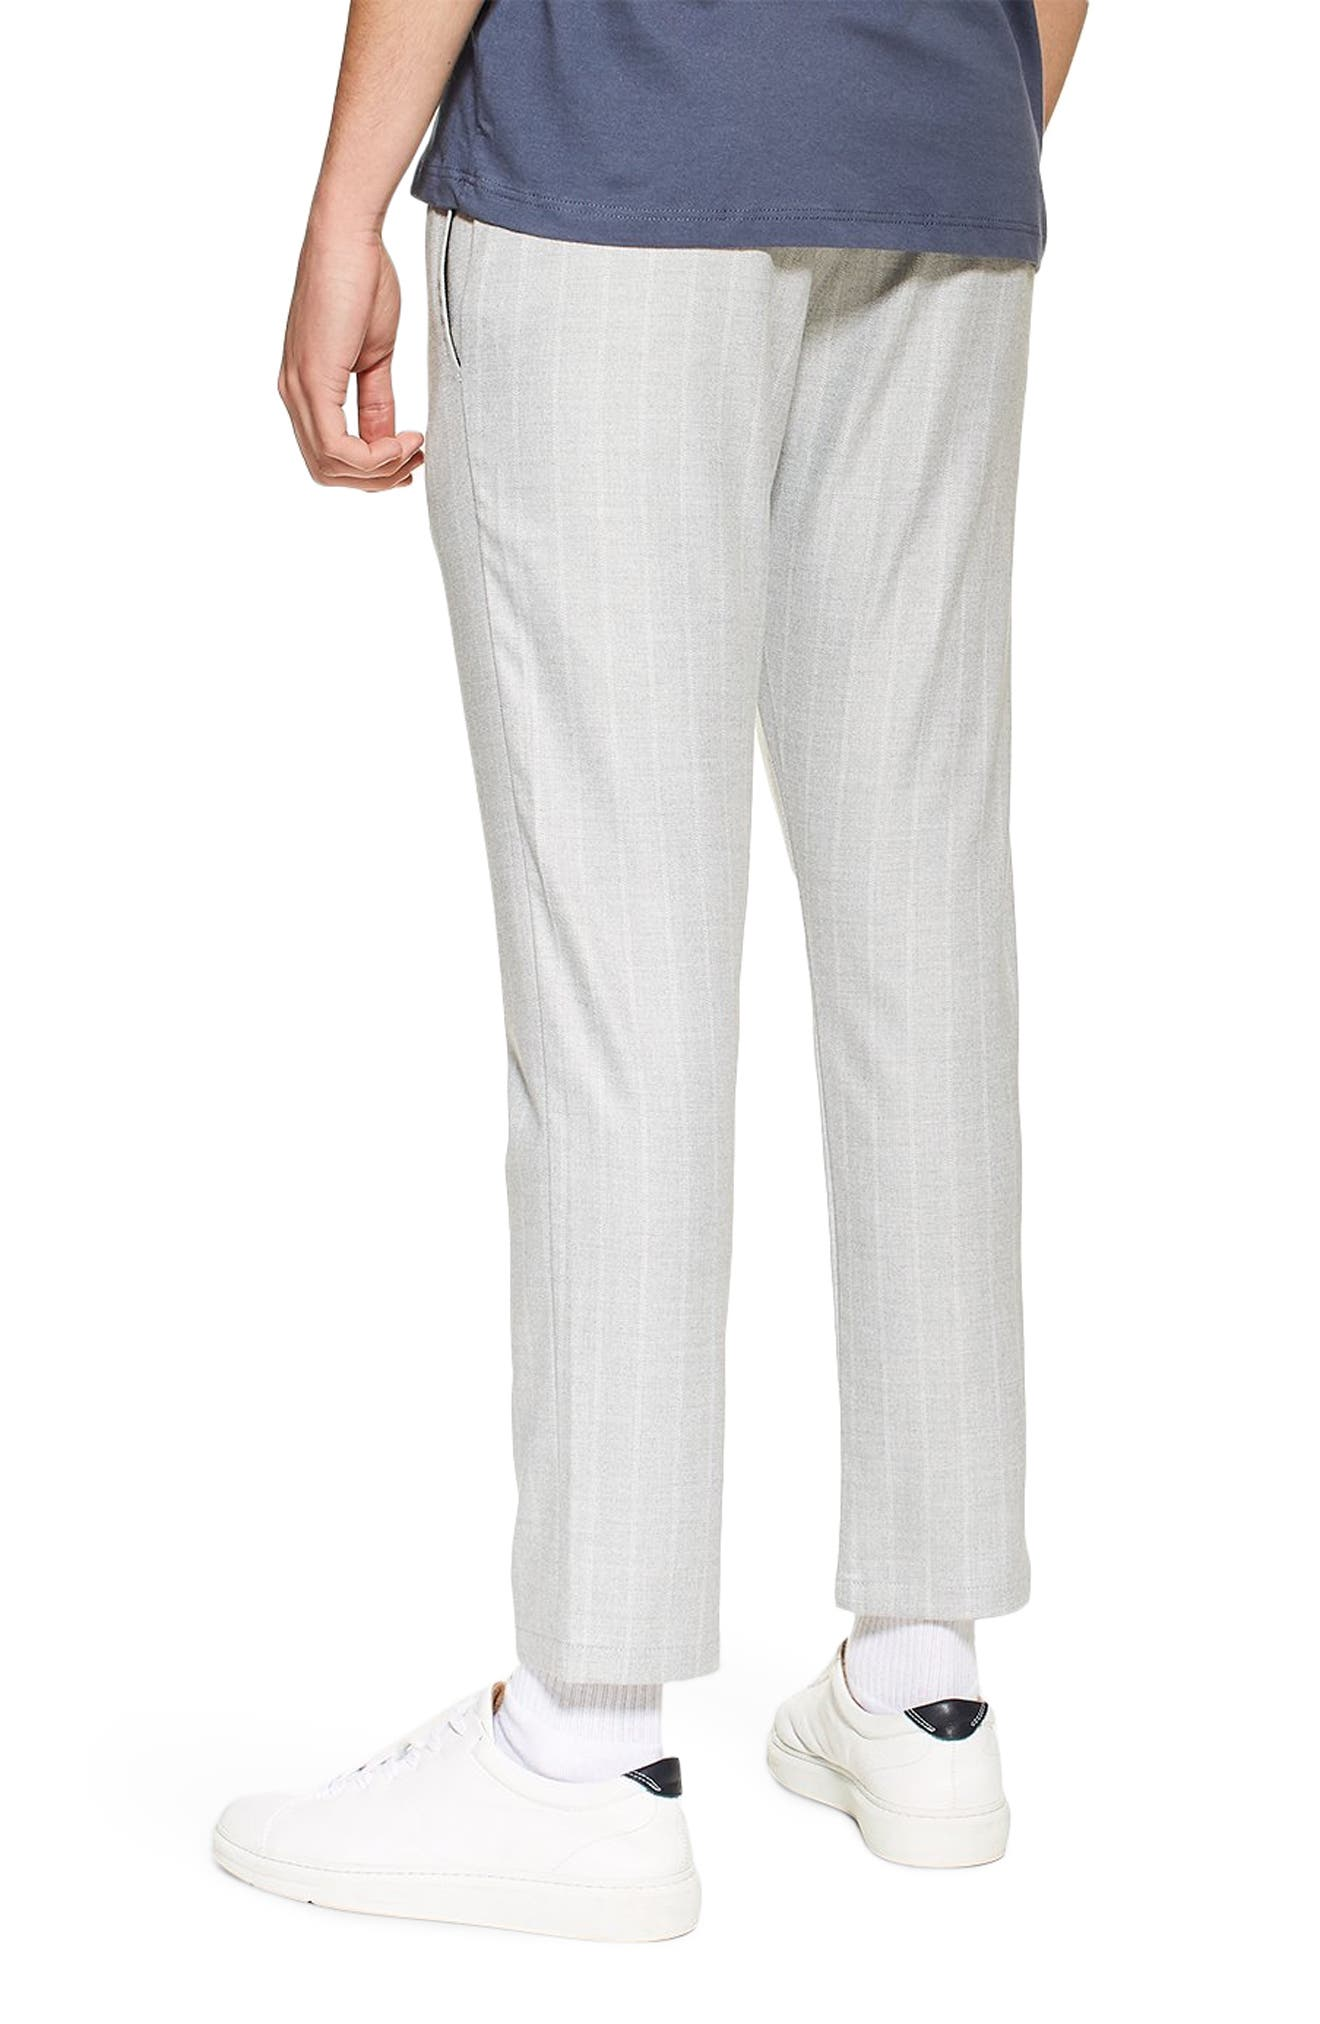 TOPMAN, Skinny Fit Stripe Crop Trousers, Alternate thumbnail 2, color, GREY